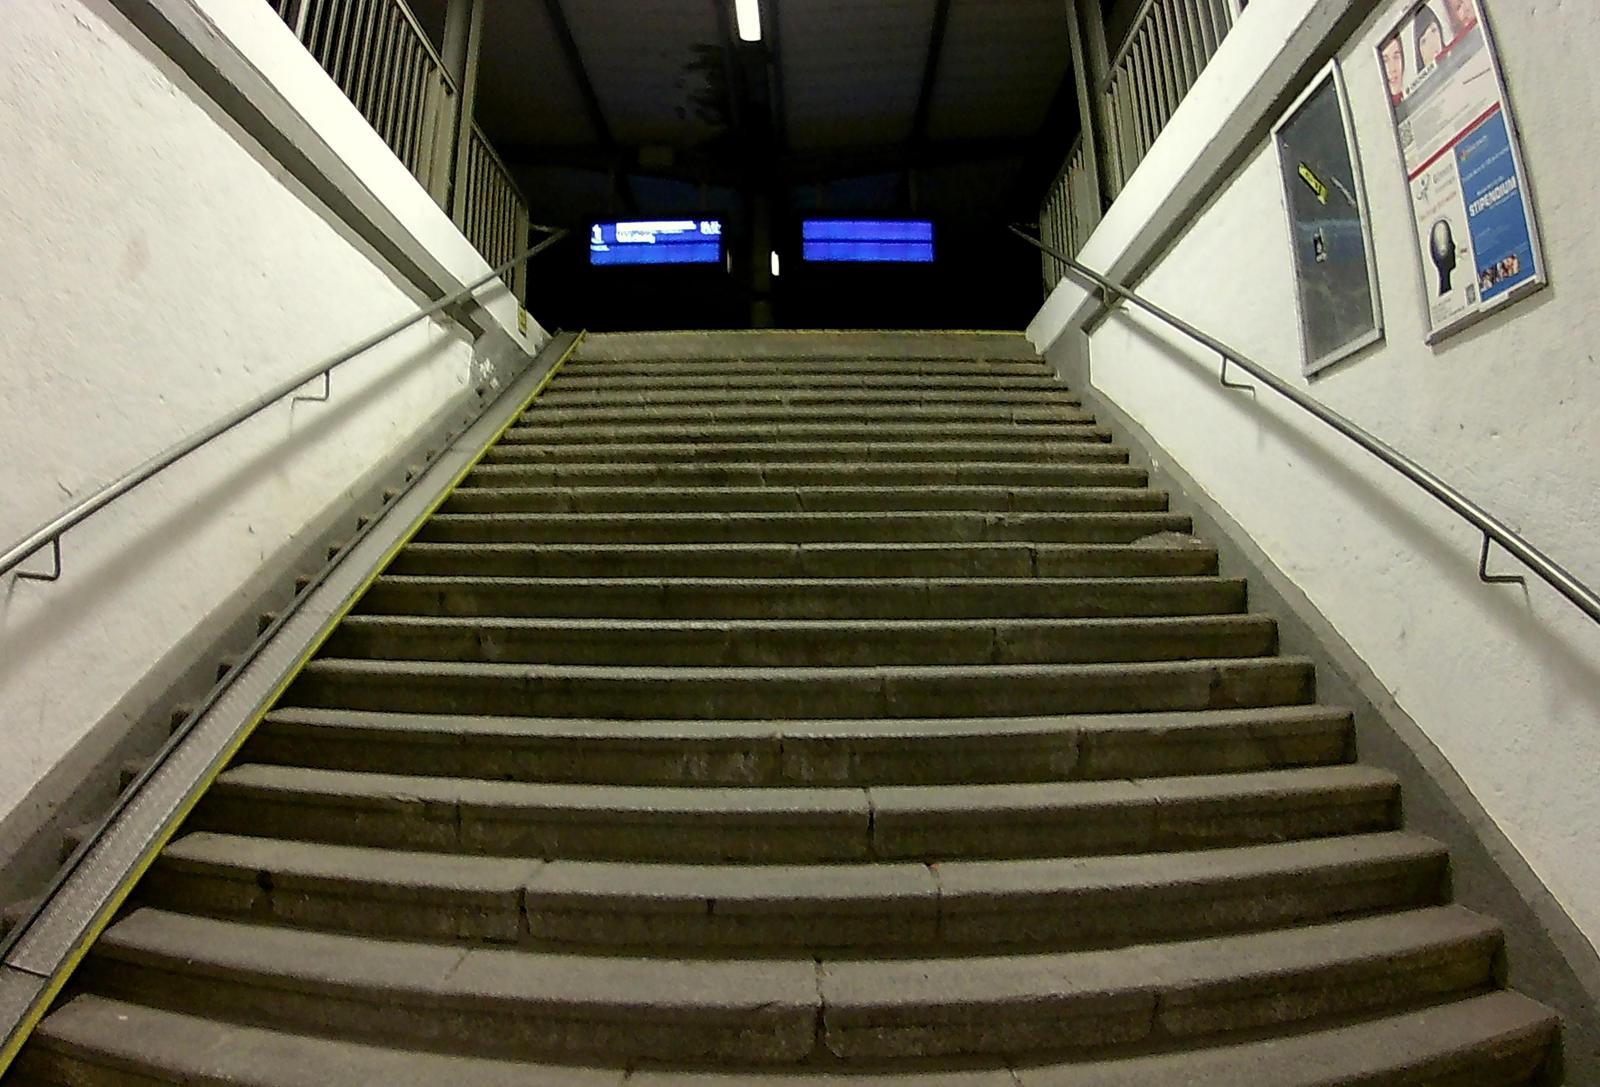 stair to platform 1 by Mittelfranke